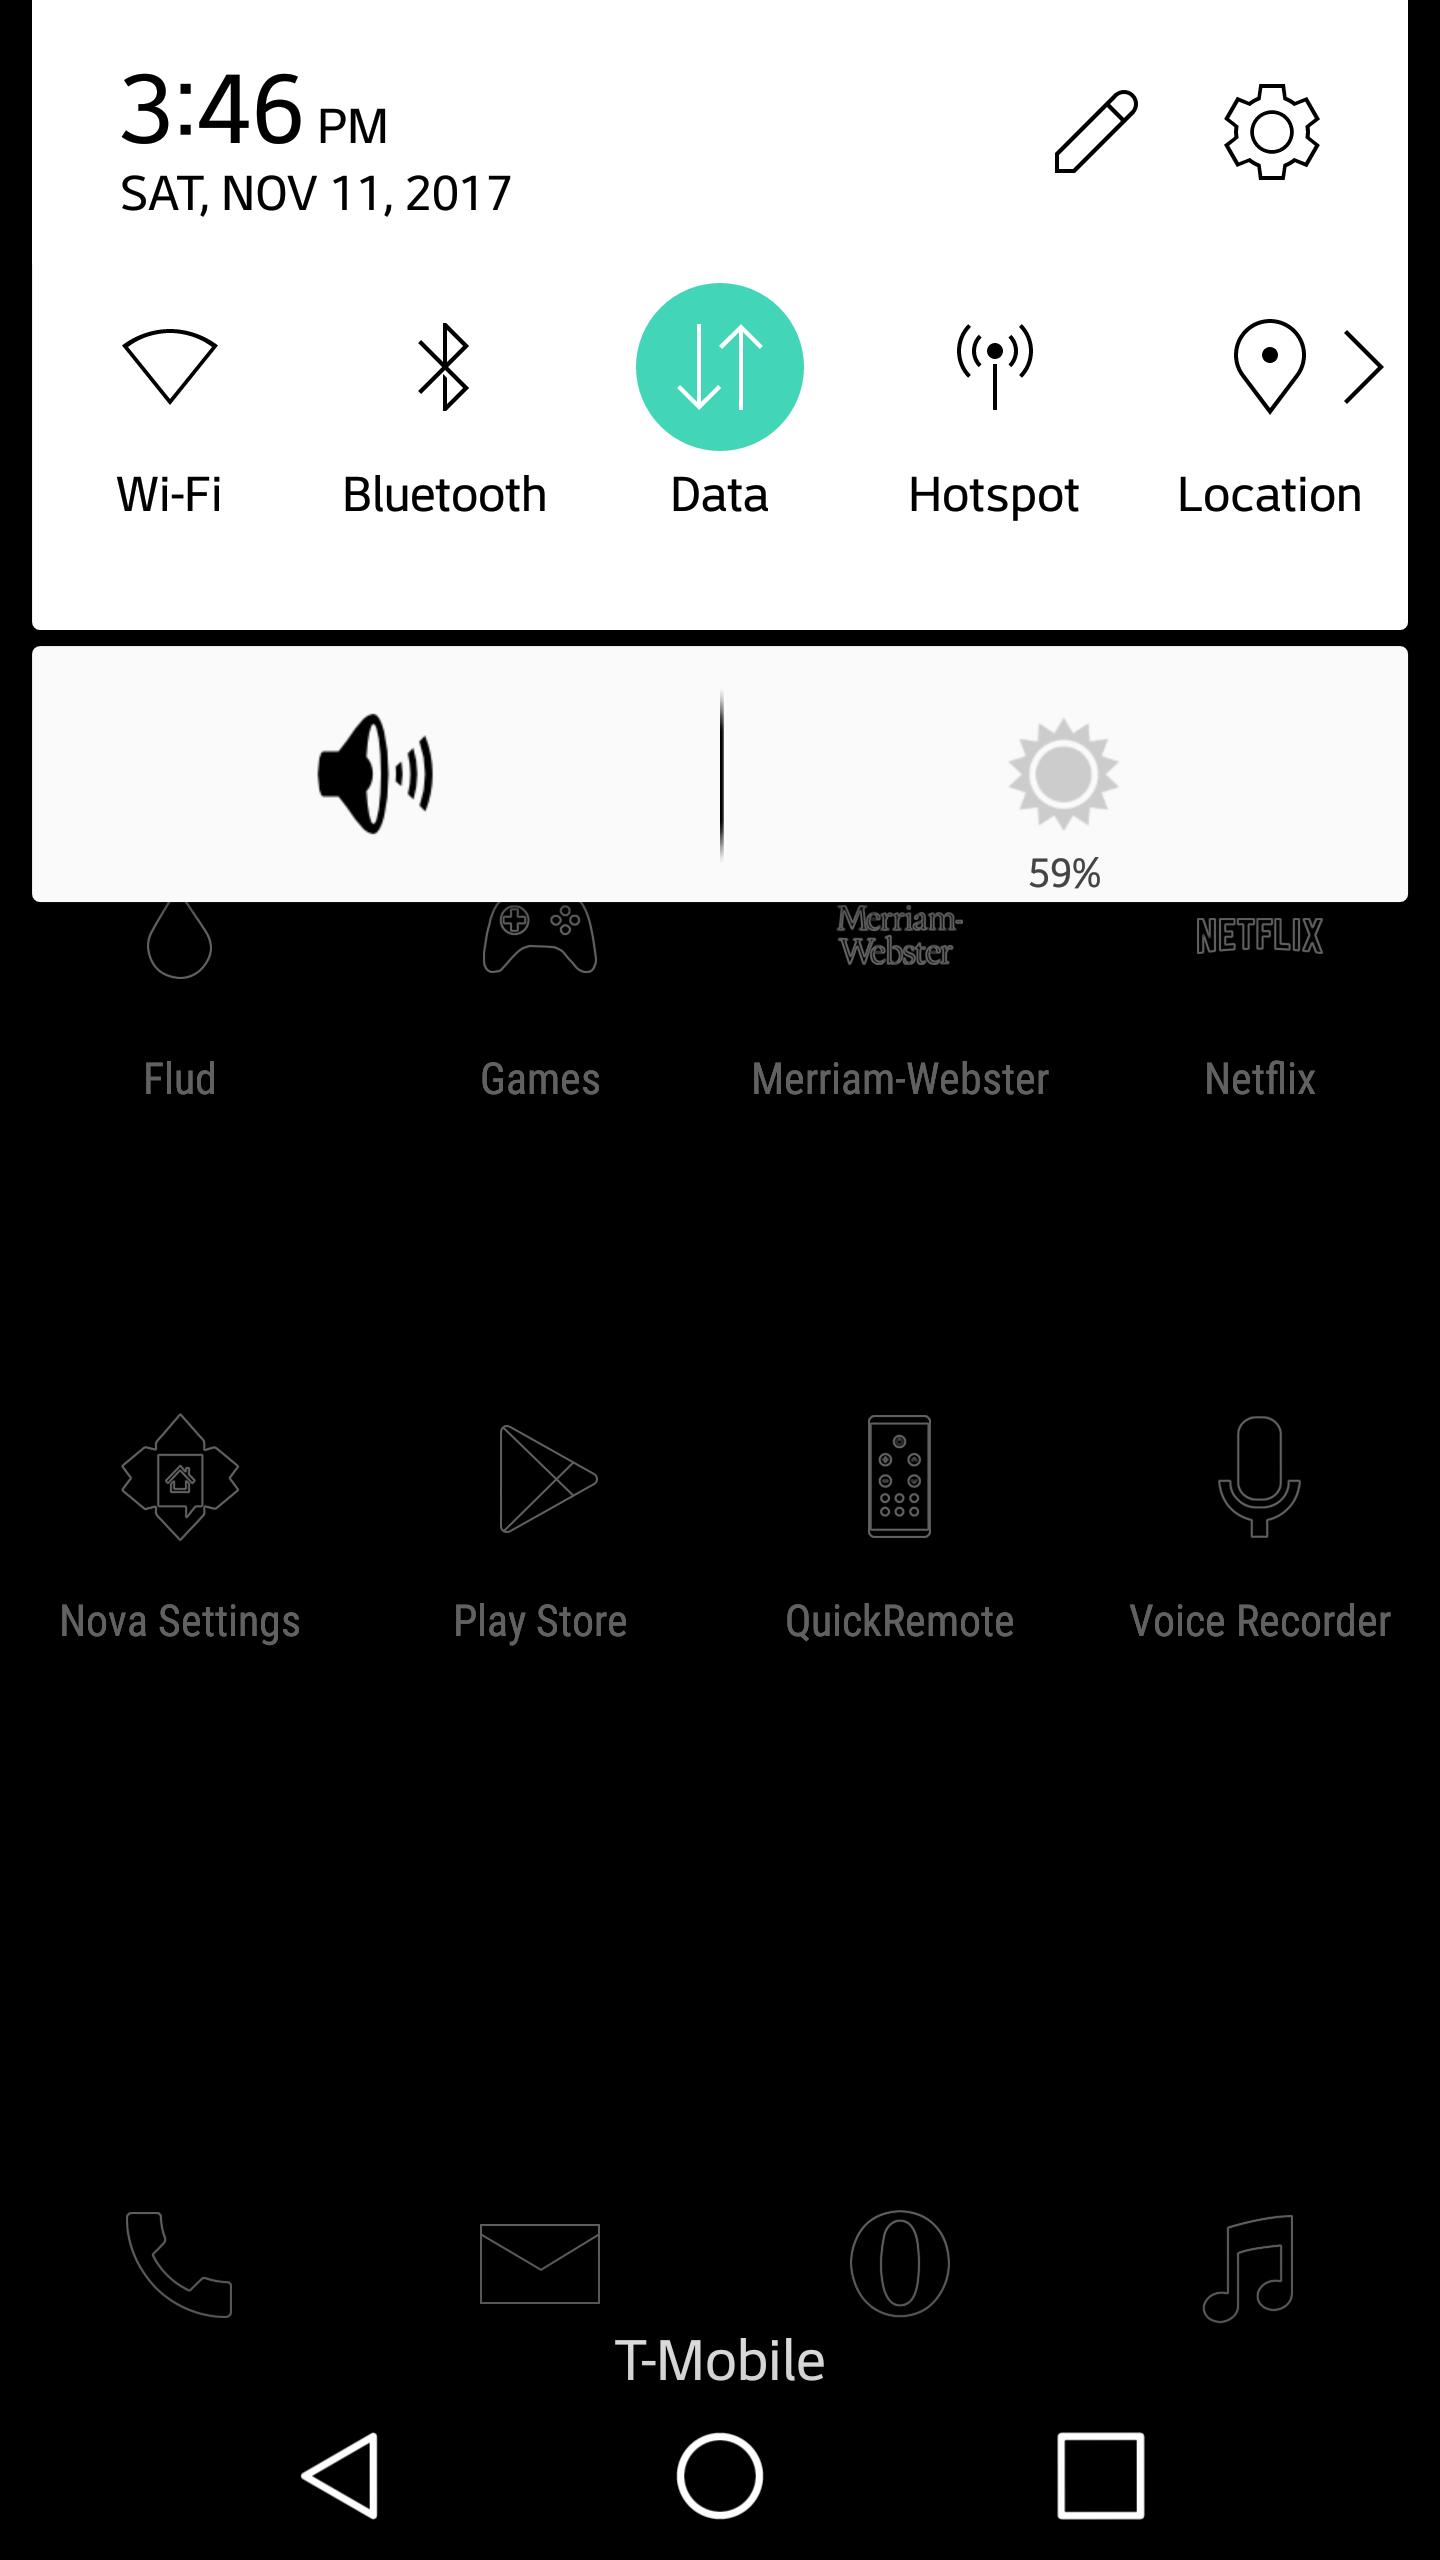 Screenshot_2017-11-11-15-46-28.png